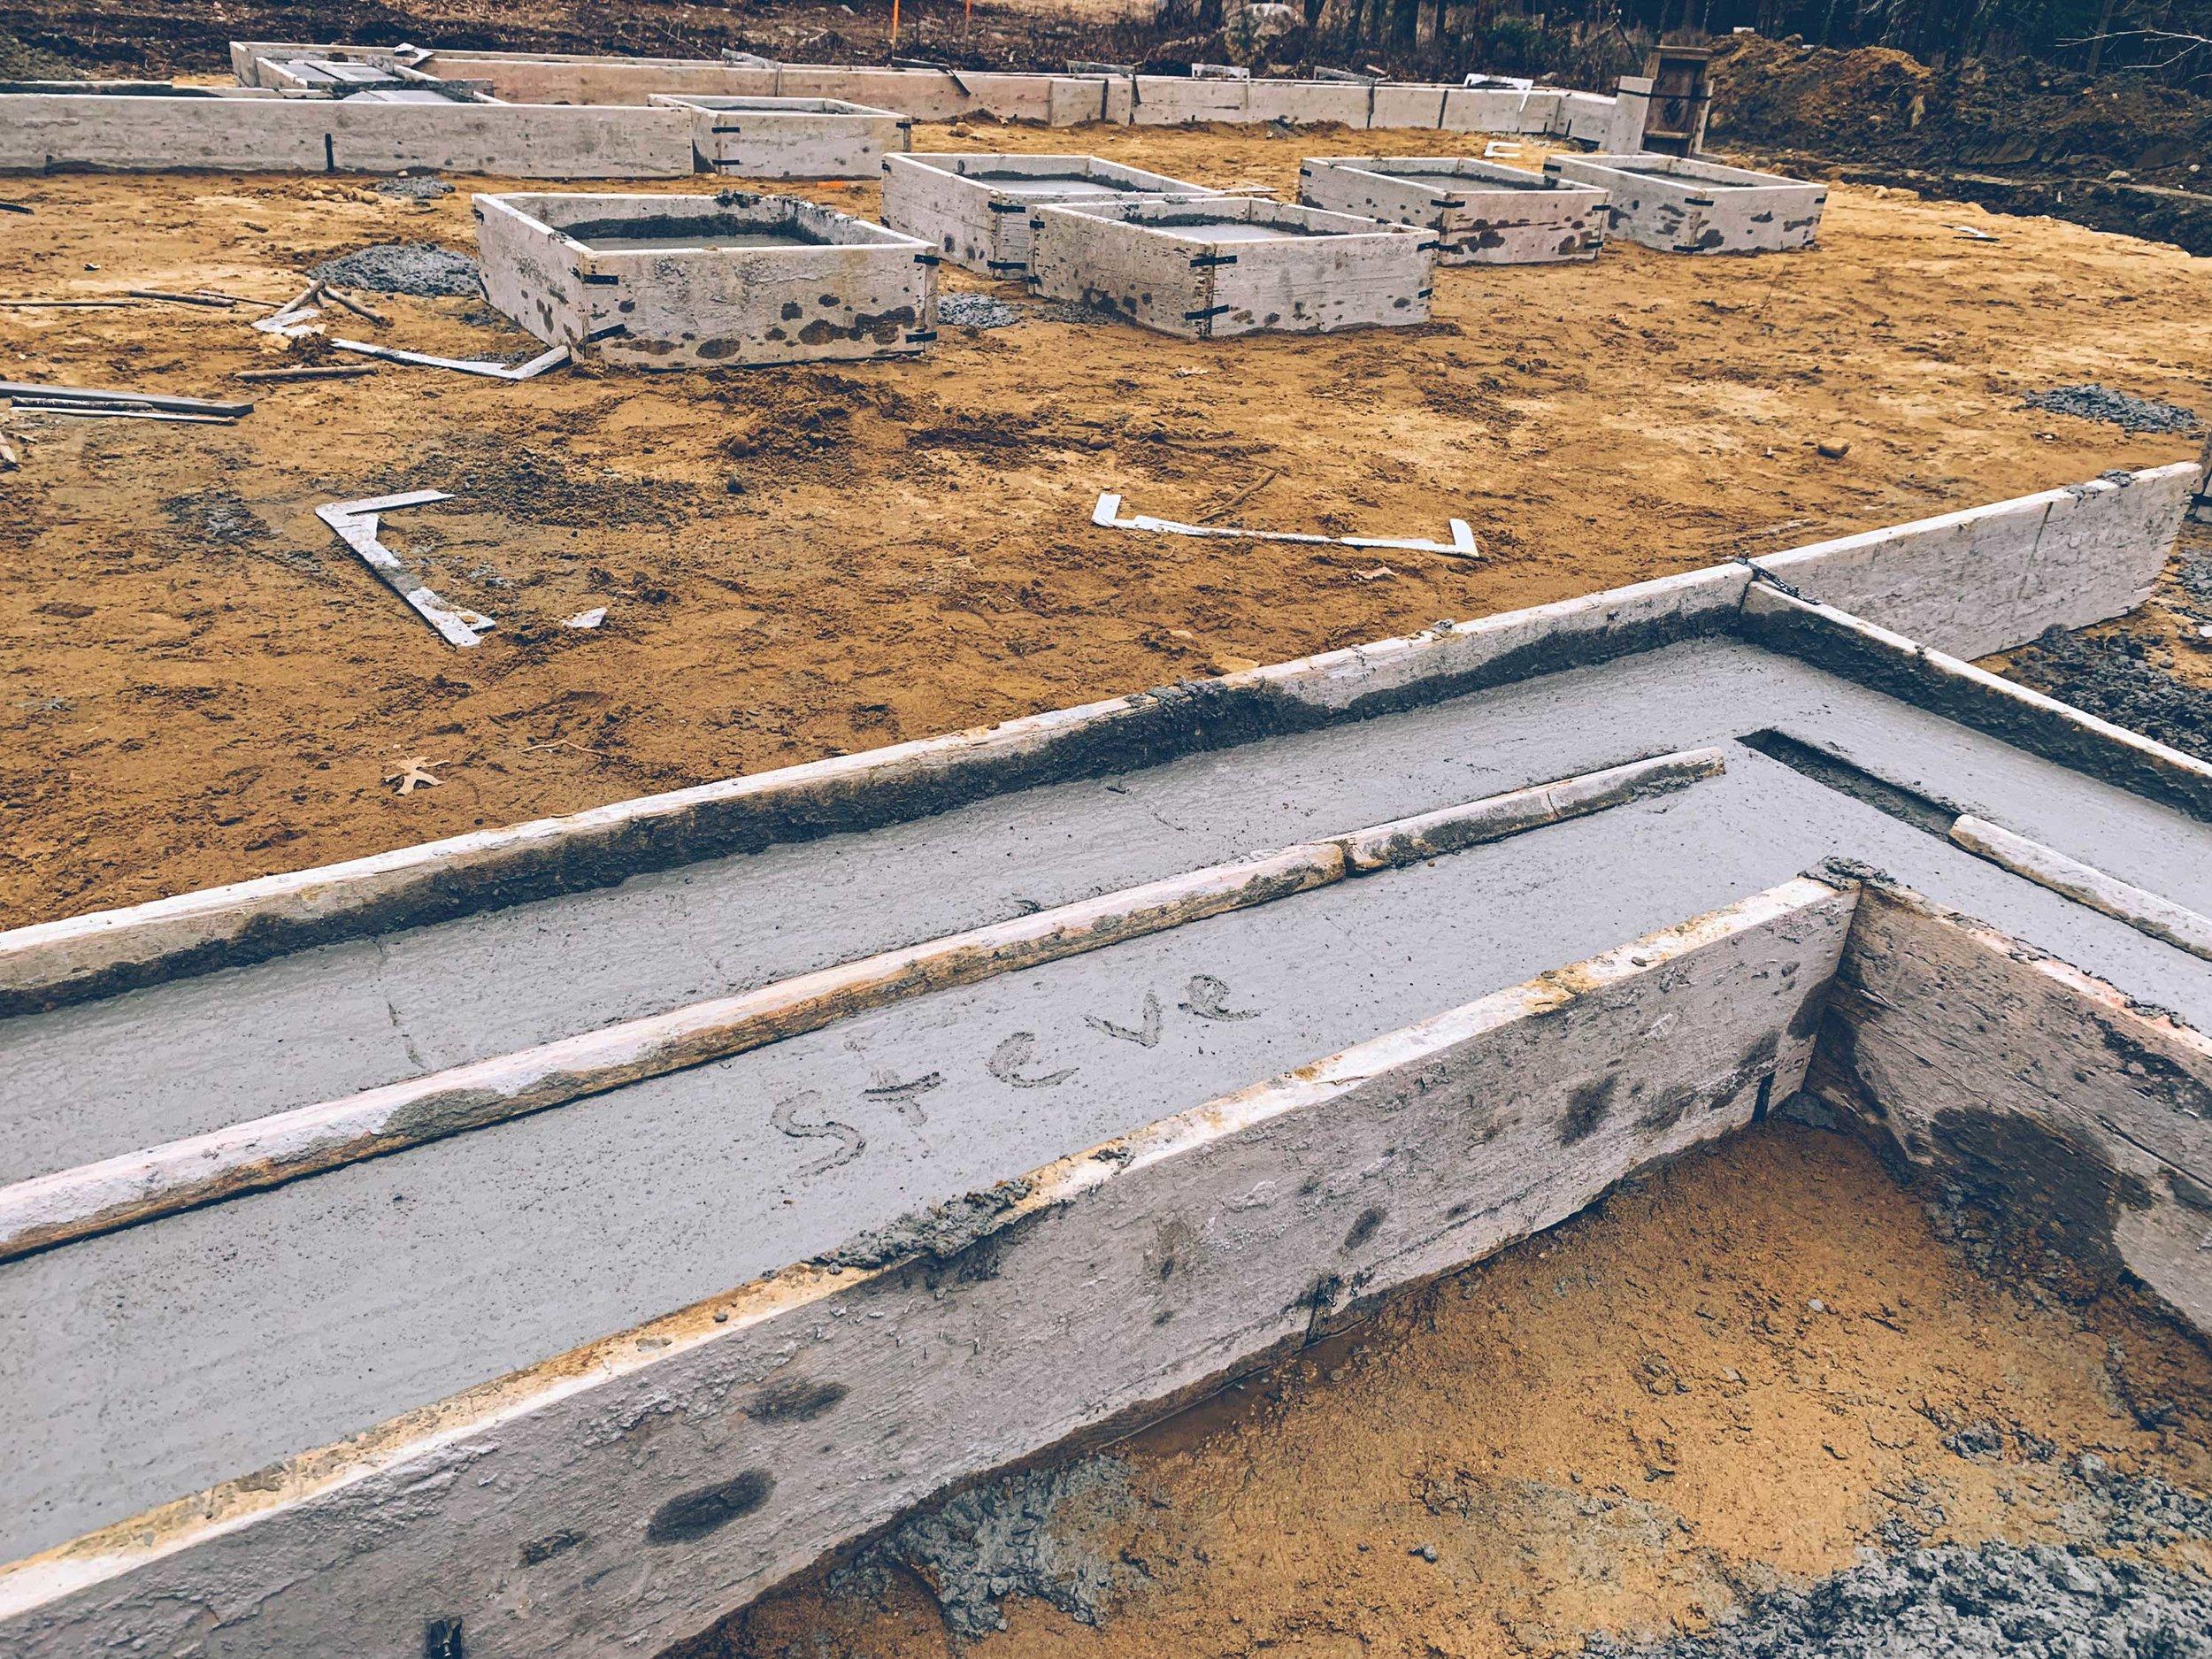 042419_Excavation_6-2.jpg